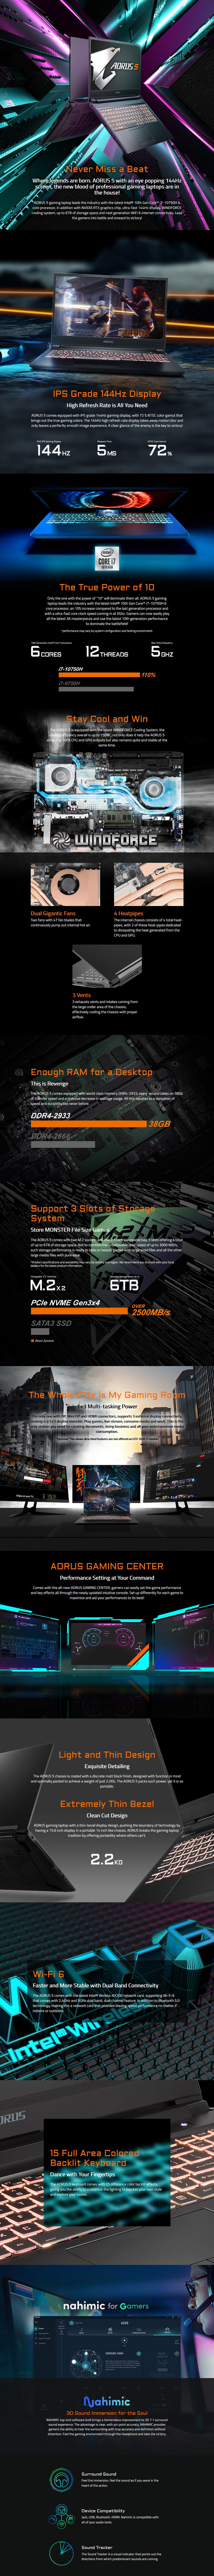 "Gigabyte AORUS 5 15.6"" 144Hz Gaming Laptop i7-10750H 16GB 512GB GTX 1660 Ti W10H - Overview 1"